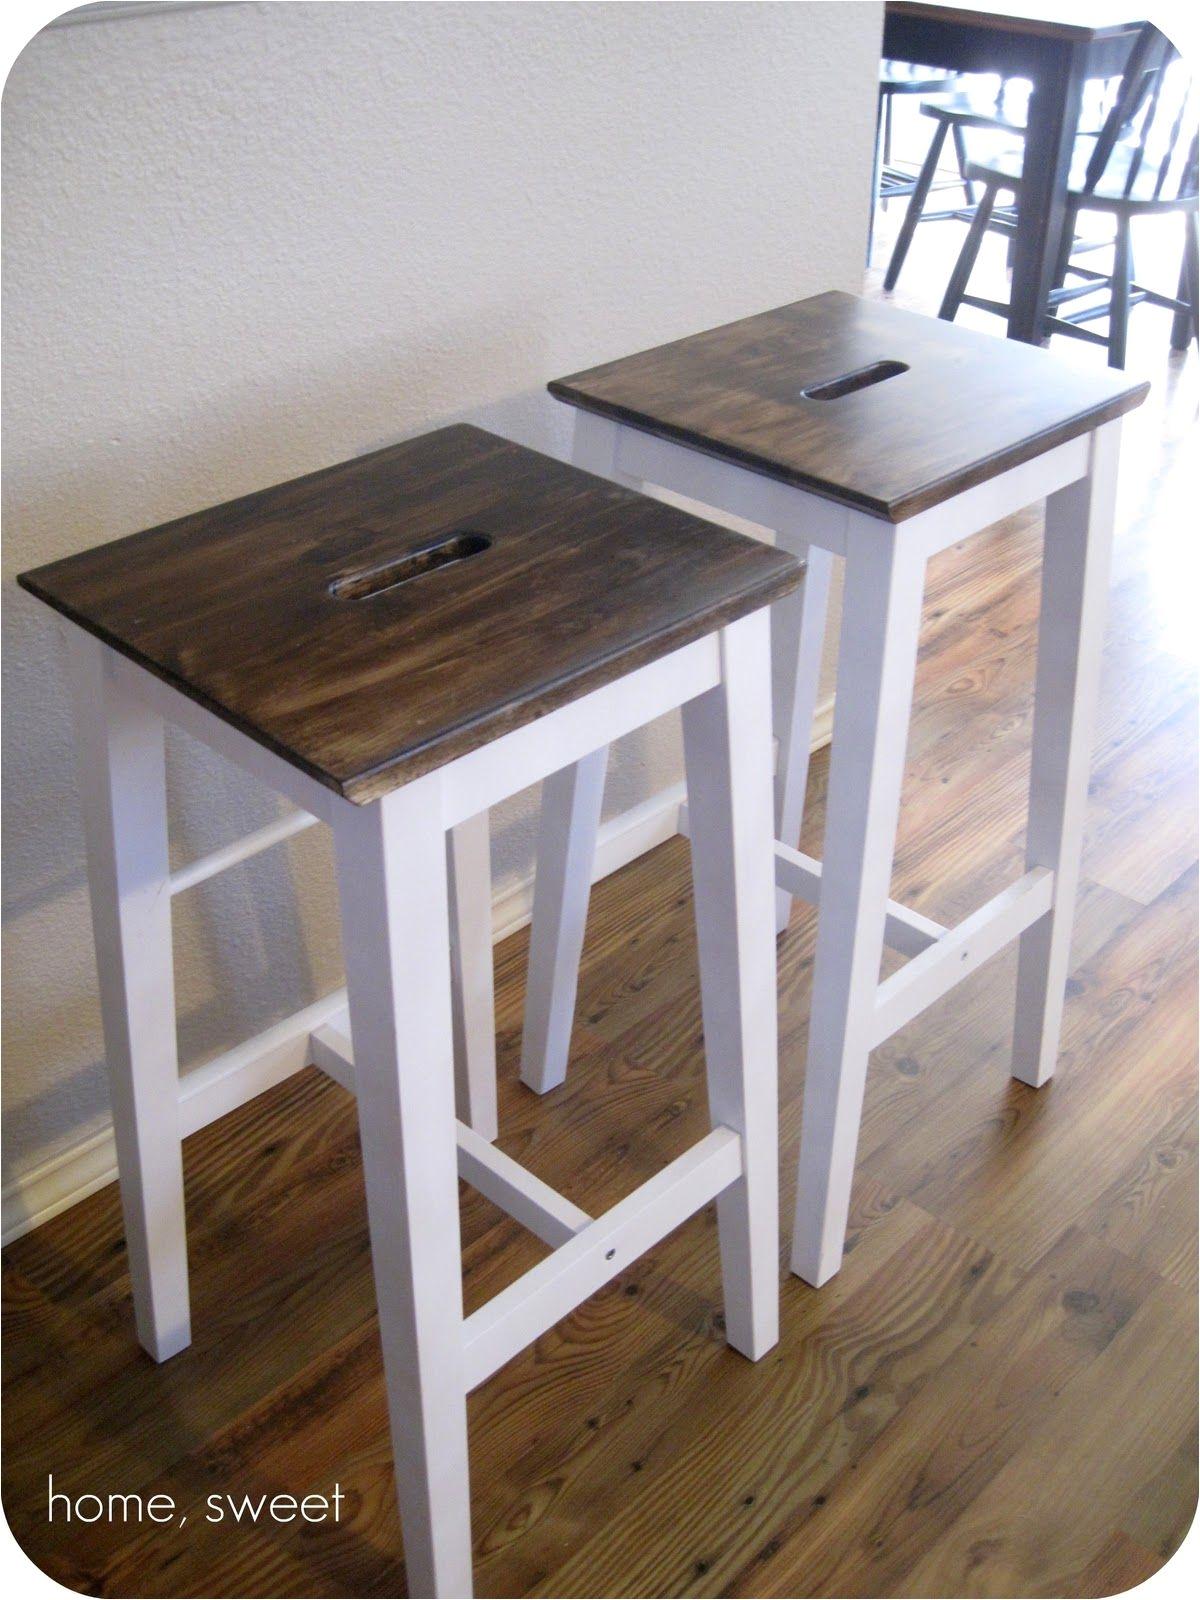 furniture elegant ikea bar stools for interior home design ideas terrific white wood finish frame square customized ikea bar stools with teak wood indoor